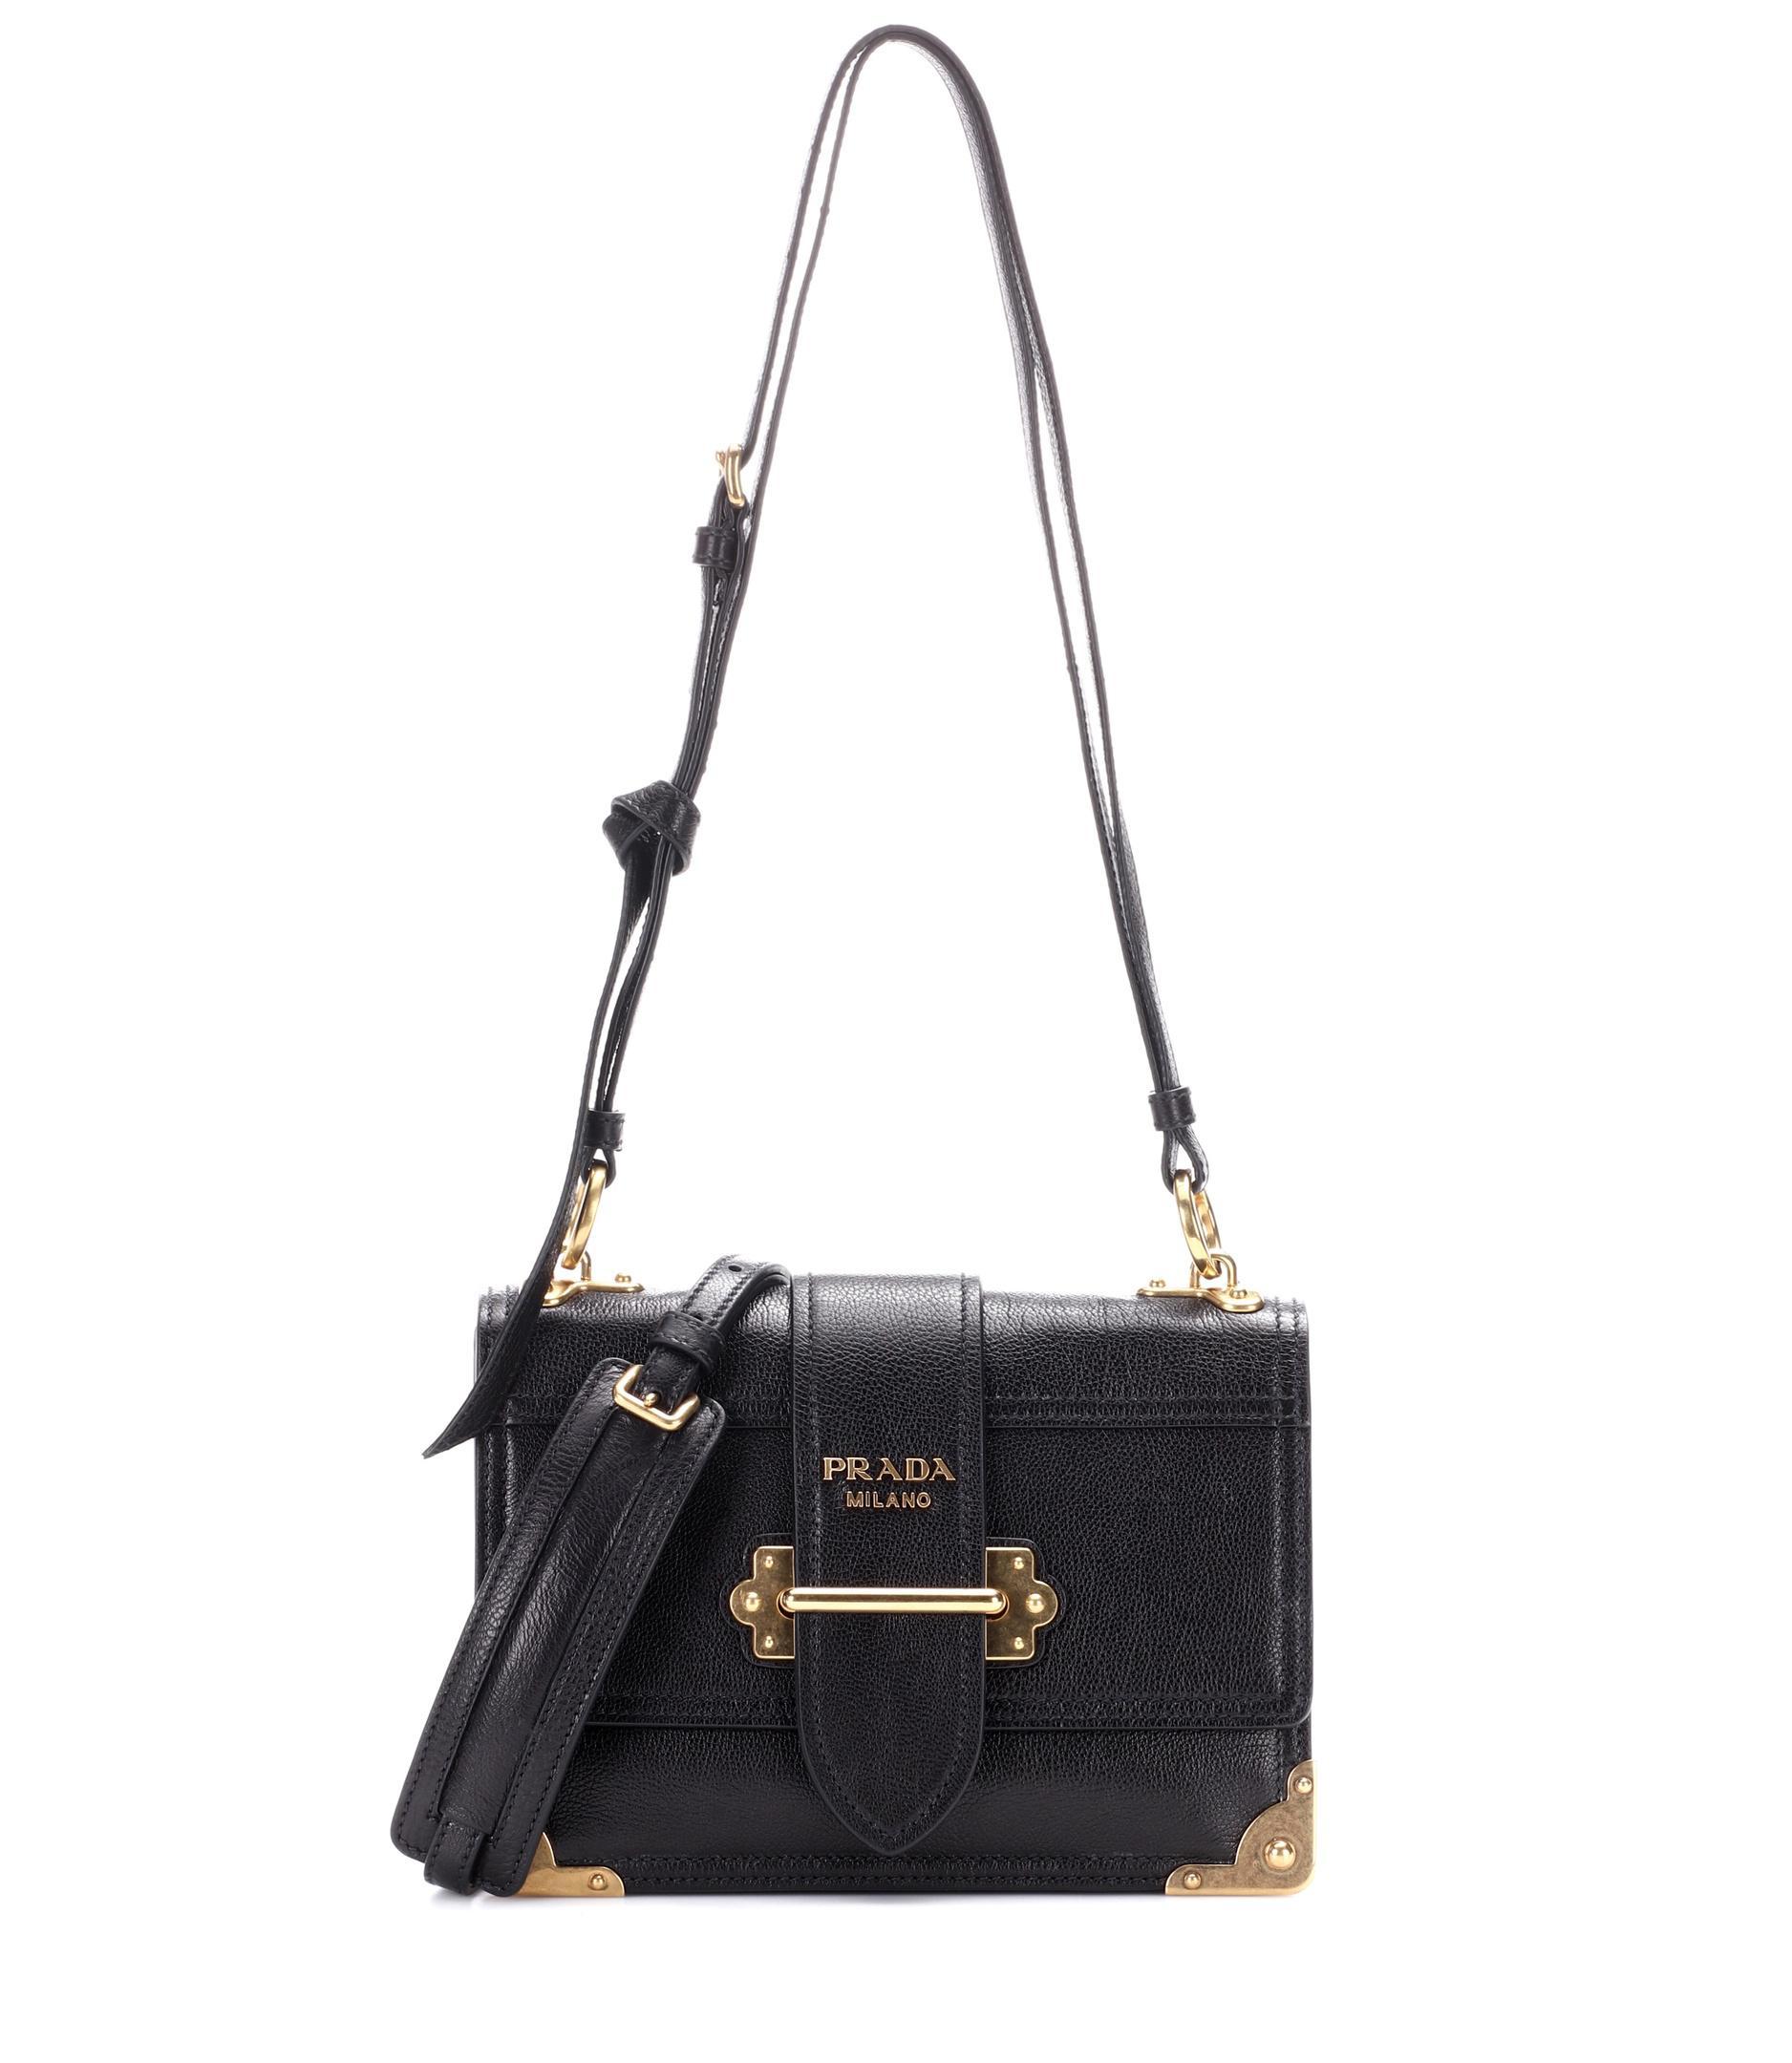 54cccd25005d Lyst - Prada Cahier Leather Shoulder Bag in Black